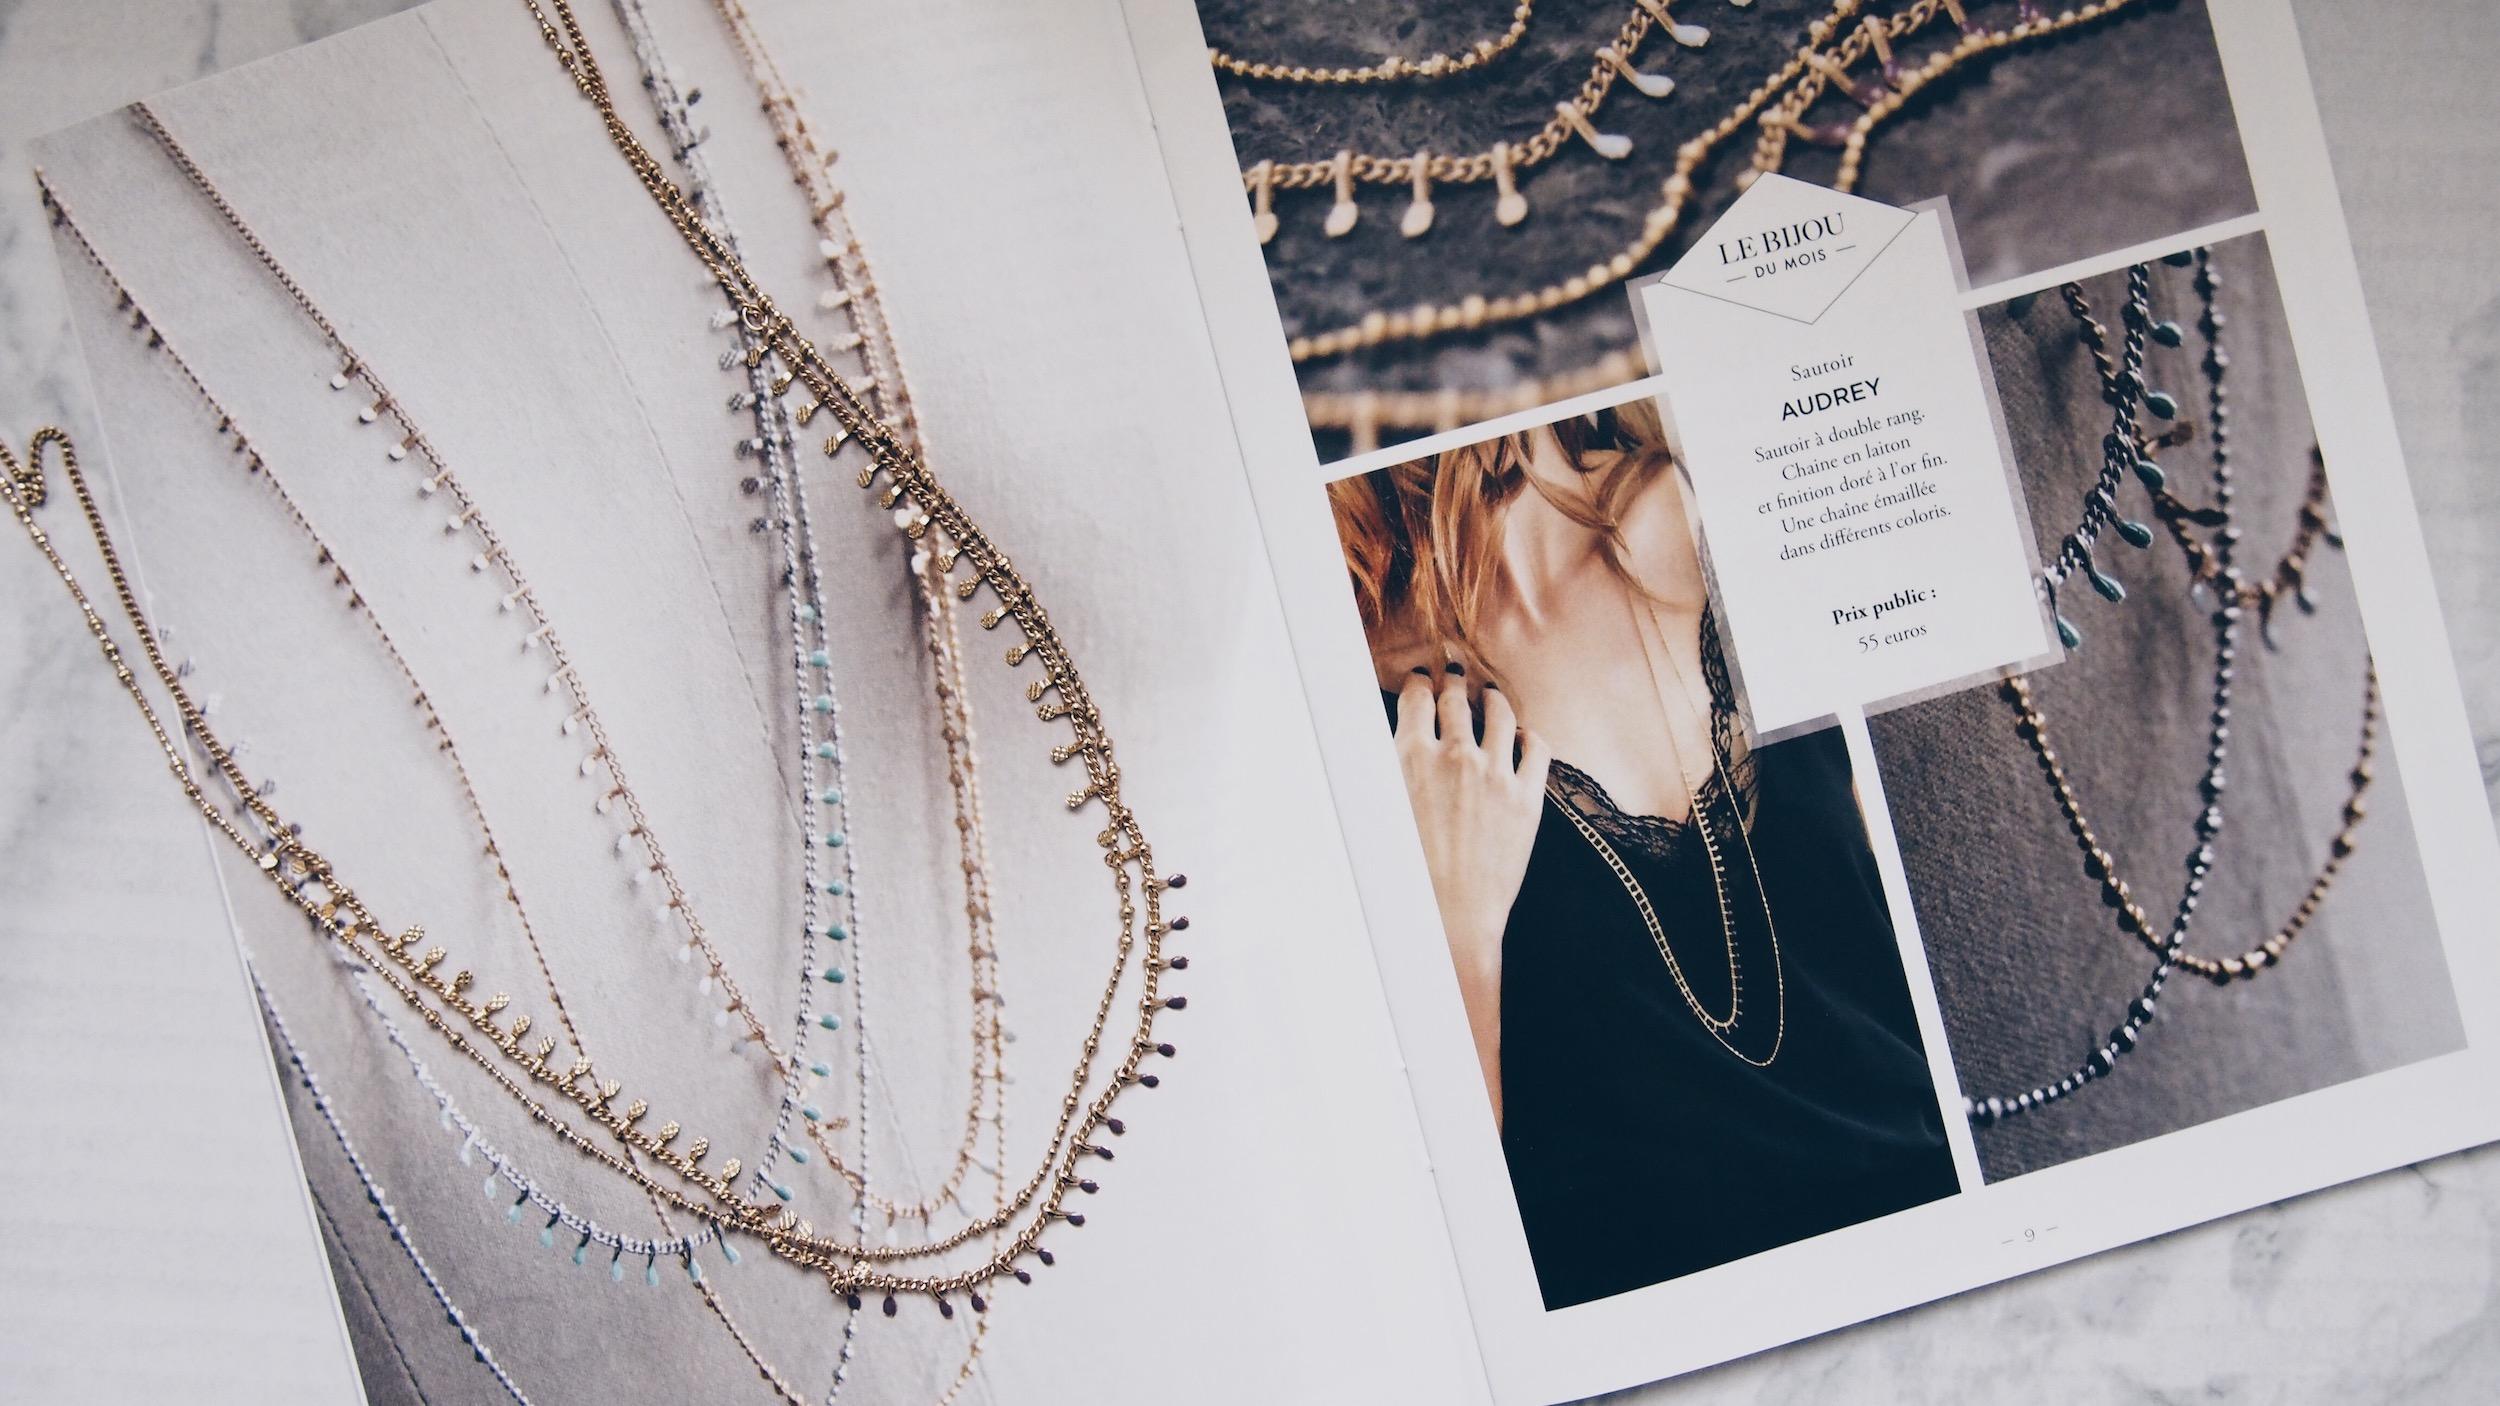 emma_et_chloe_collier_gold